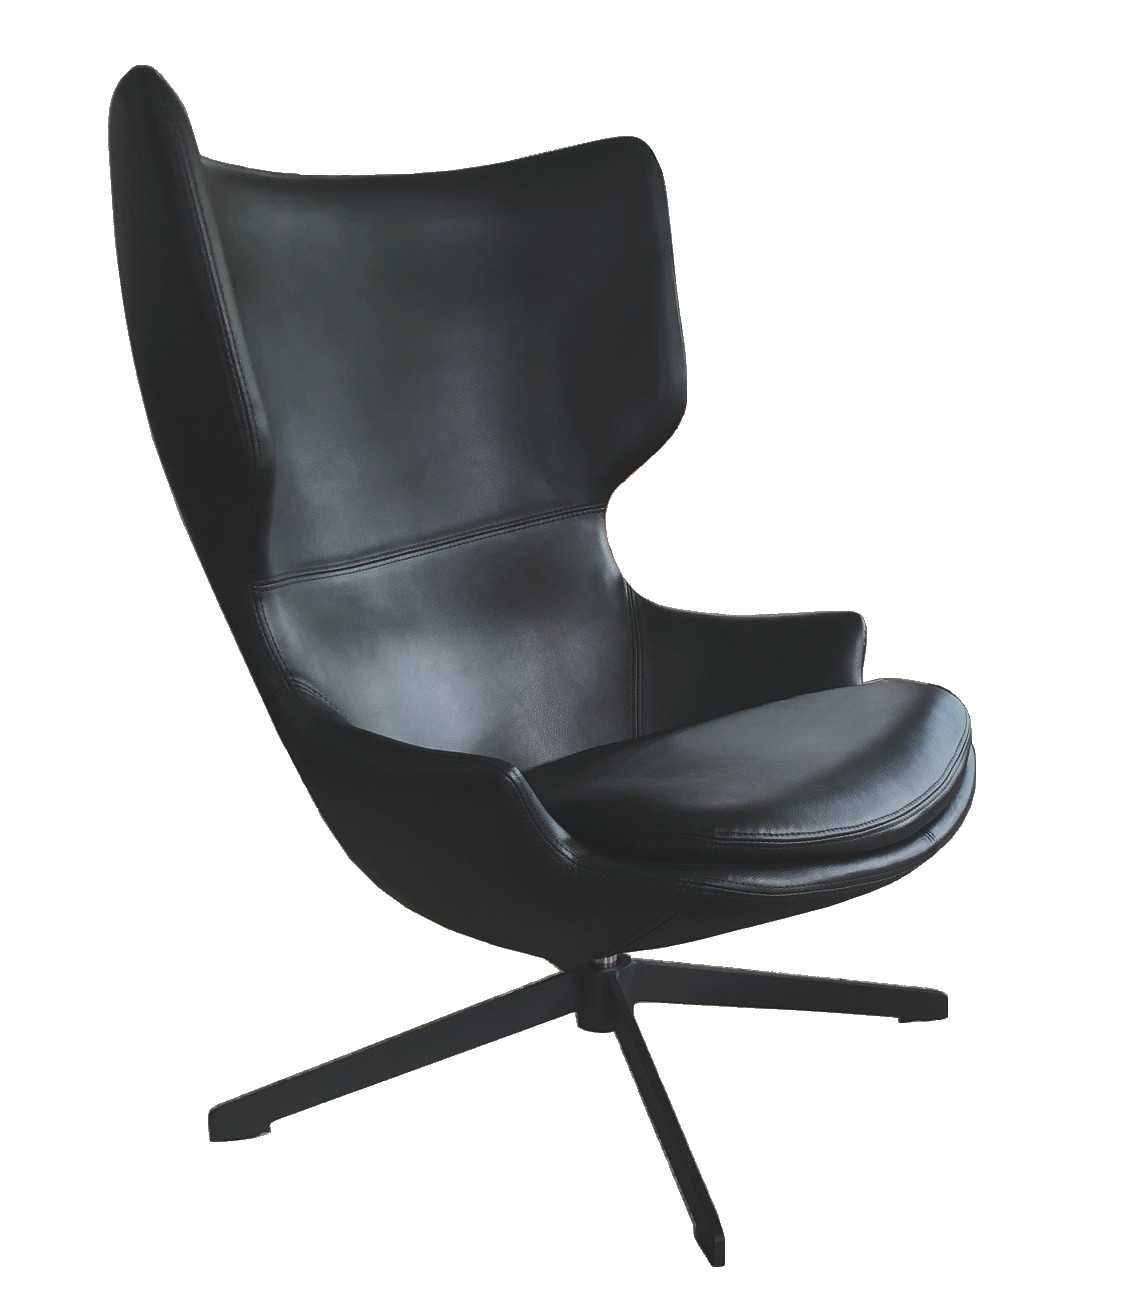 Fauteuil rotatif aspect cuir noir